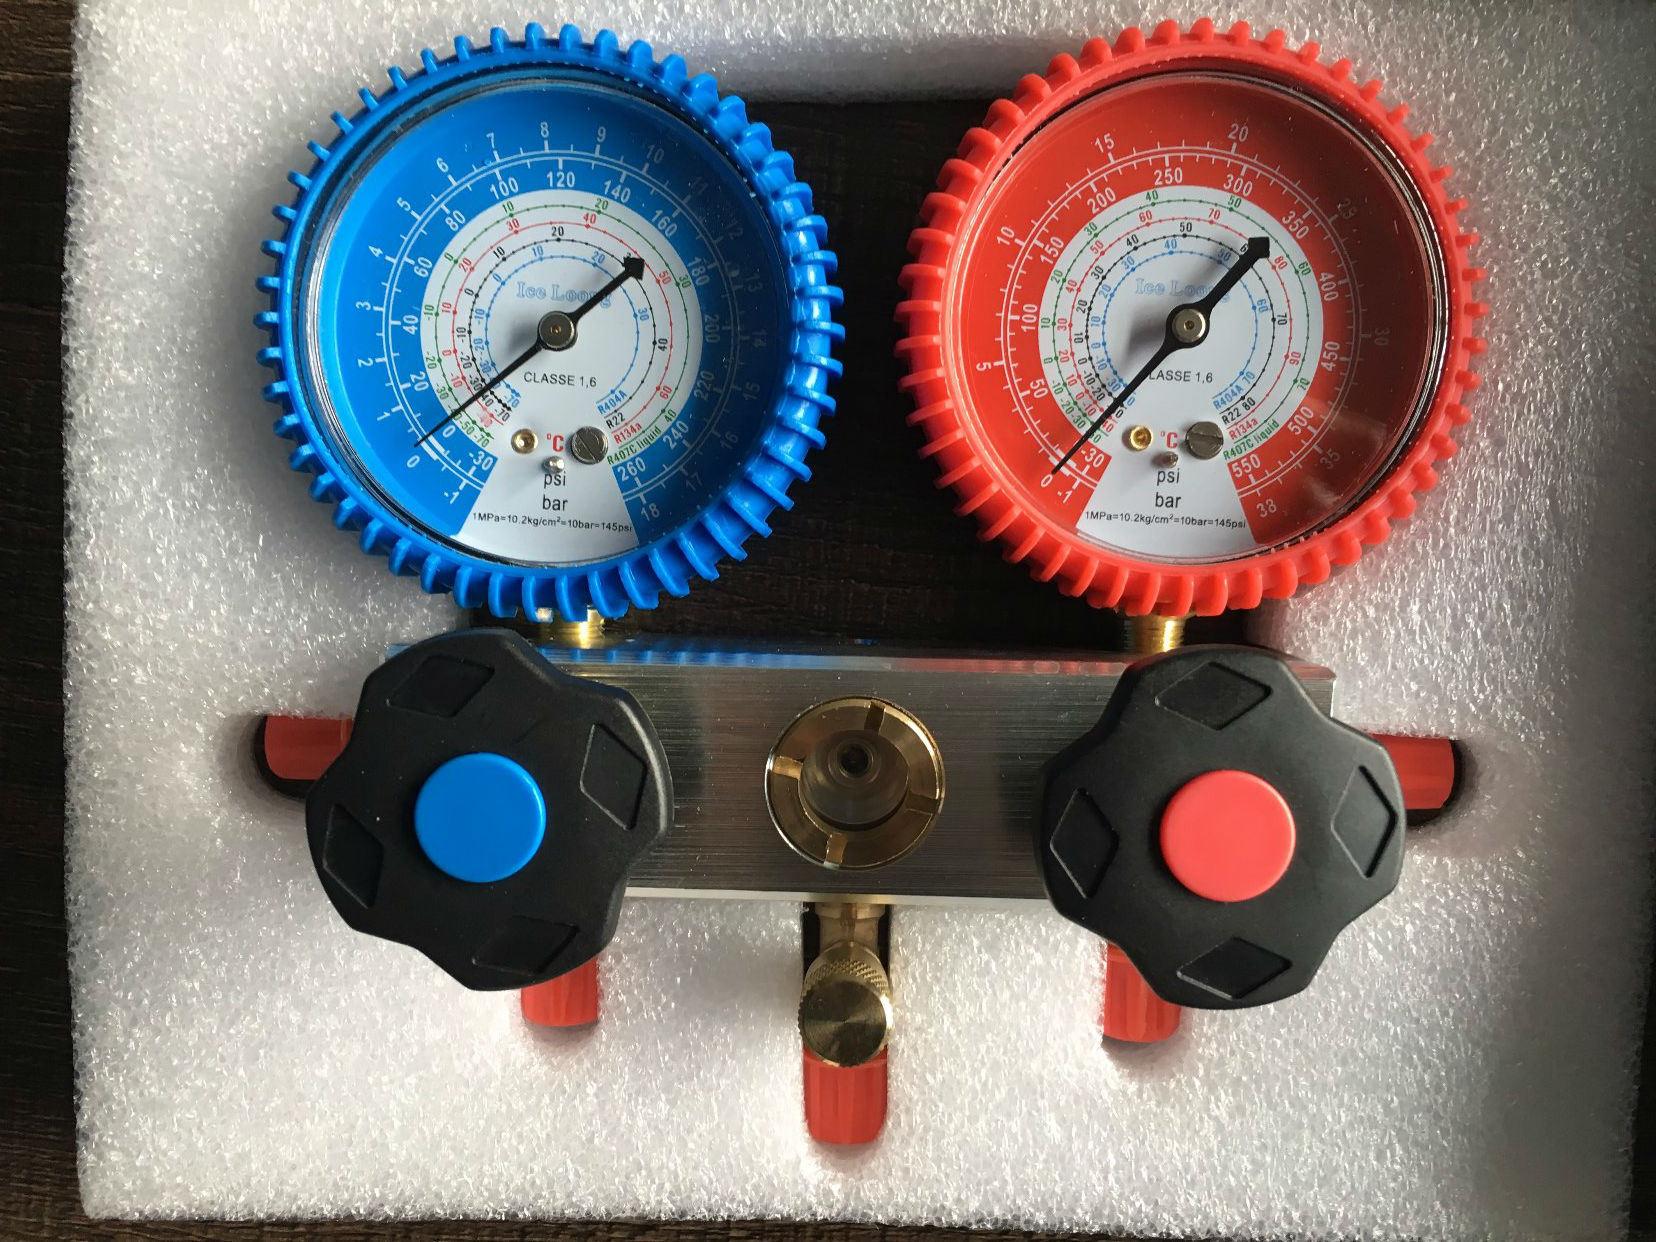 Aluminum Body High Pressure R134A R404A R407c R22 Manifold Gauge